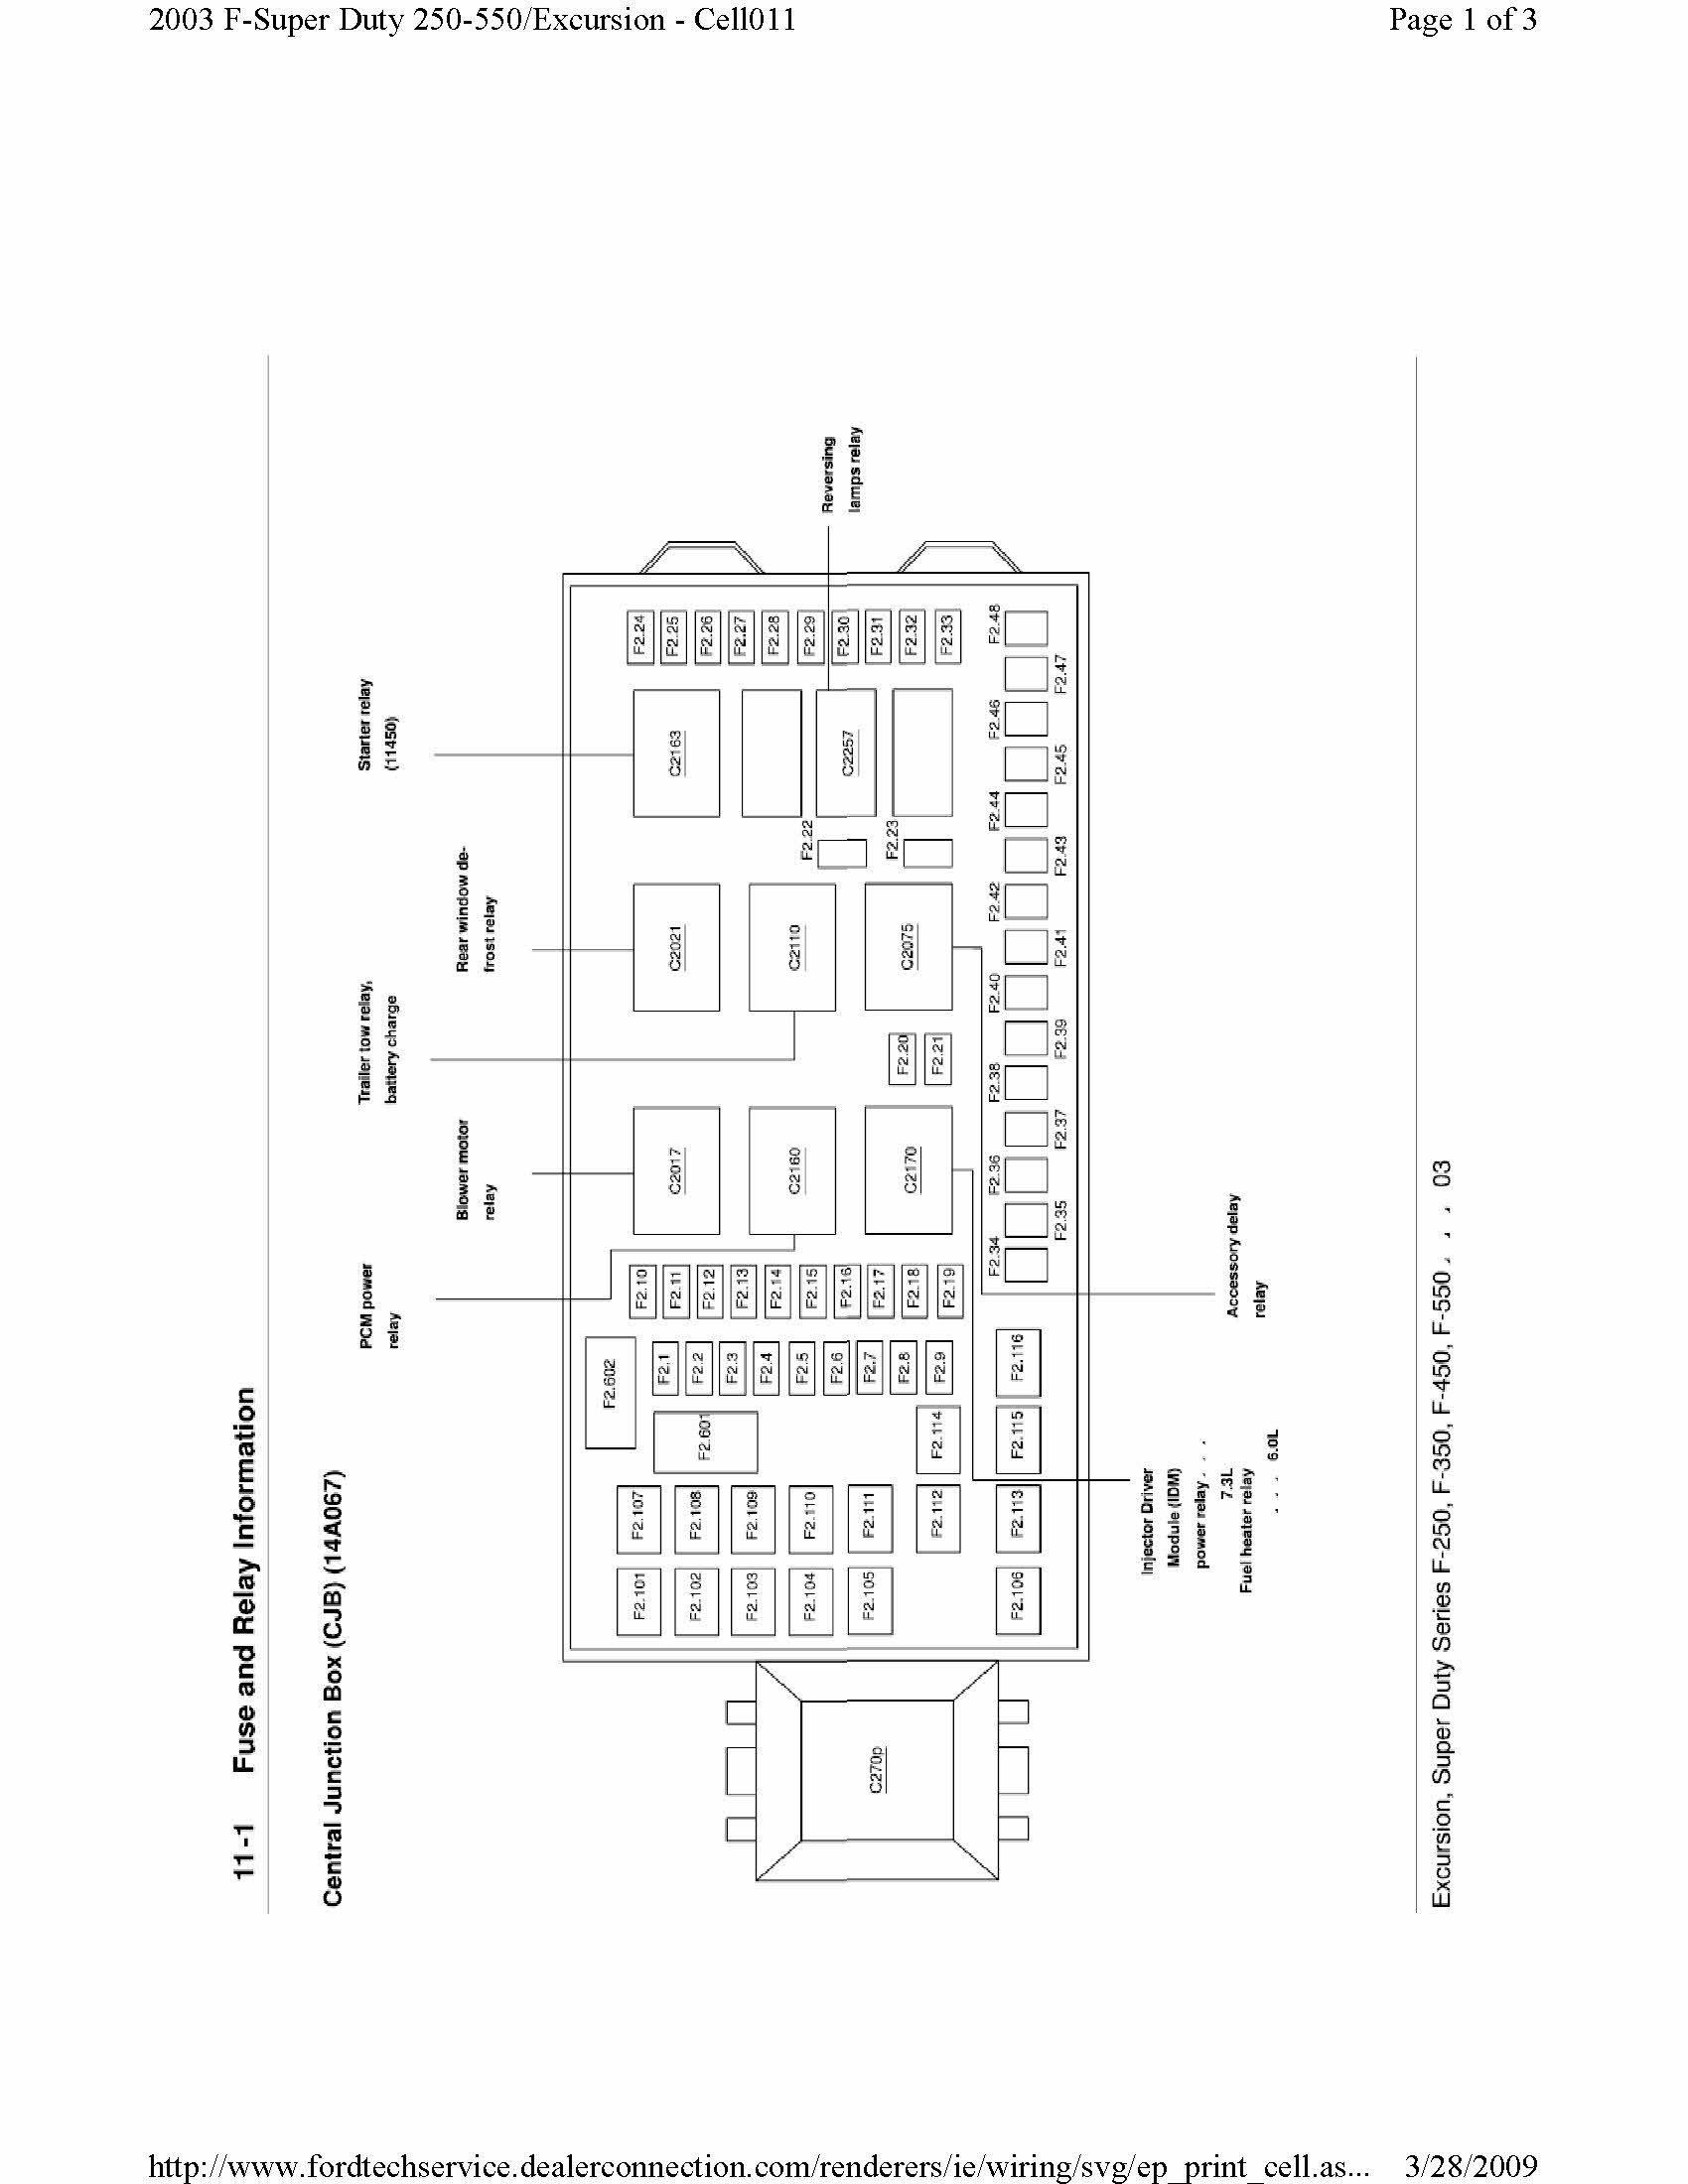 Strange 2005 Ford F250 Fuse Box Map Wiring Library Wiring Cloud Rineaidewilluminateatxorg